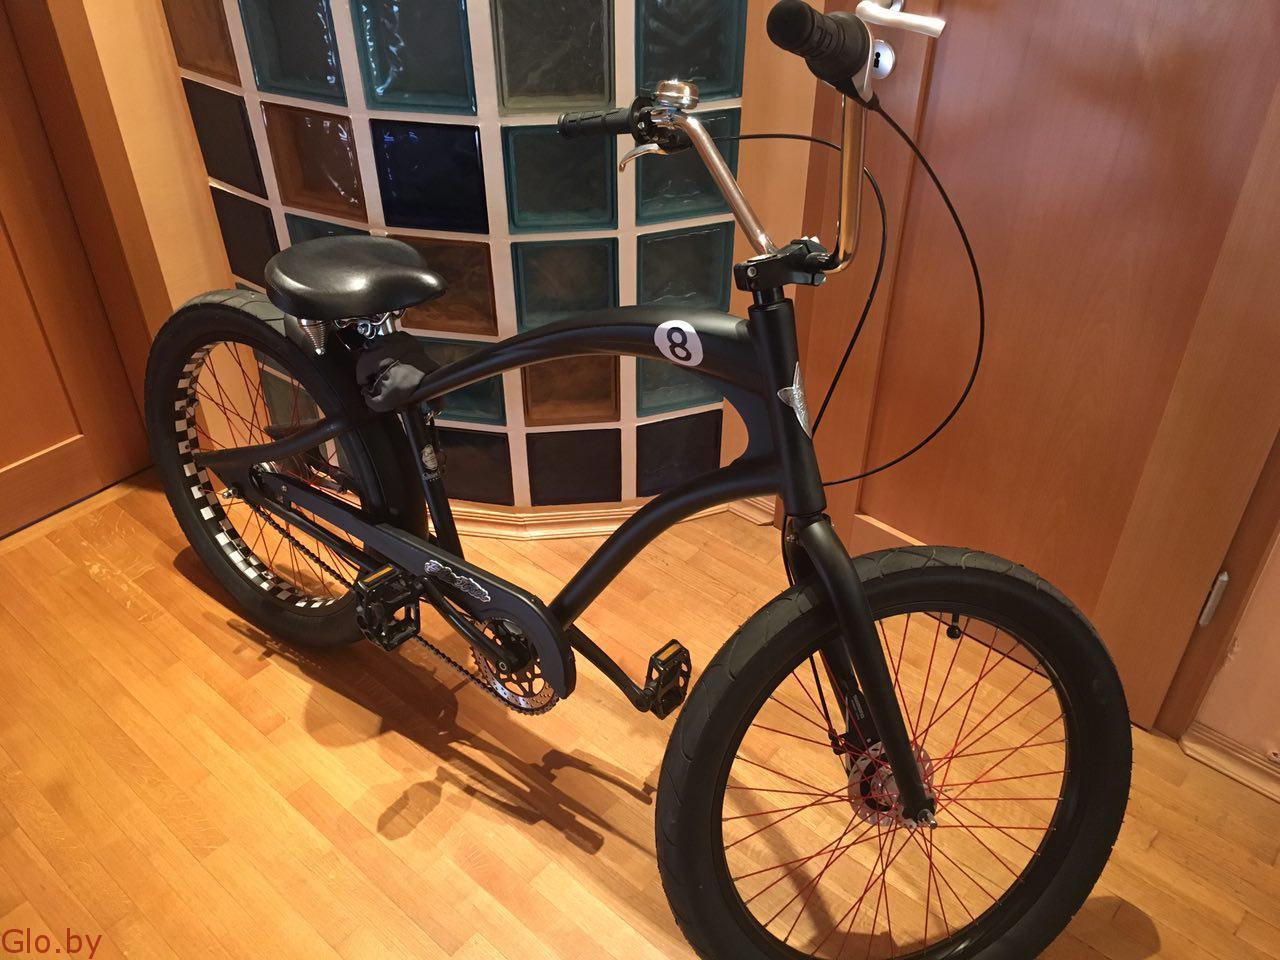 Велосипед Electra\' Straight 8 электра КОПИЯ